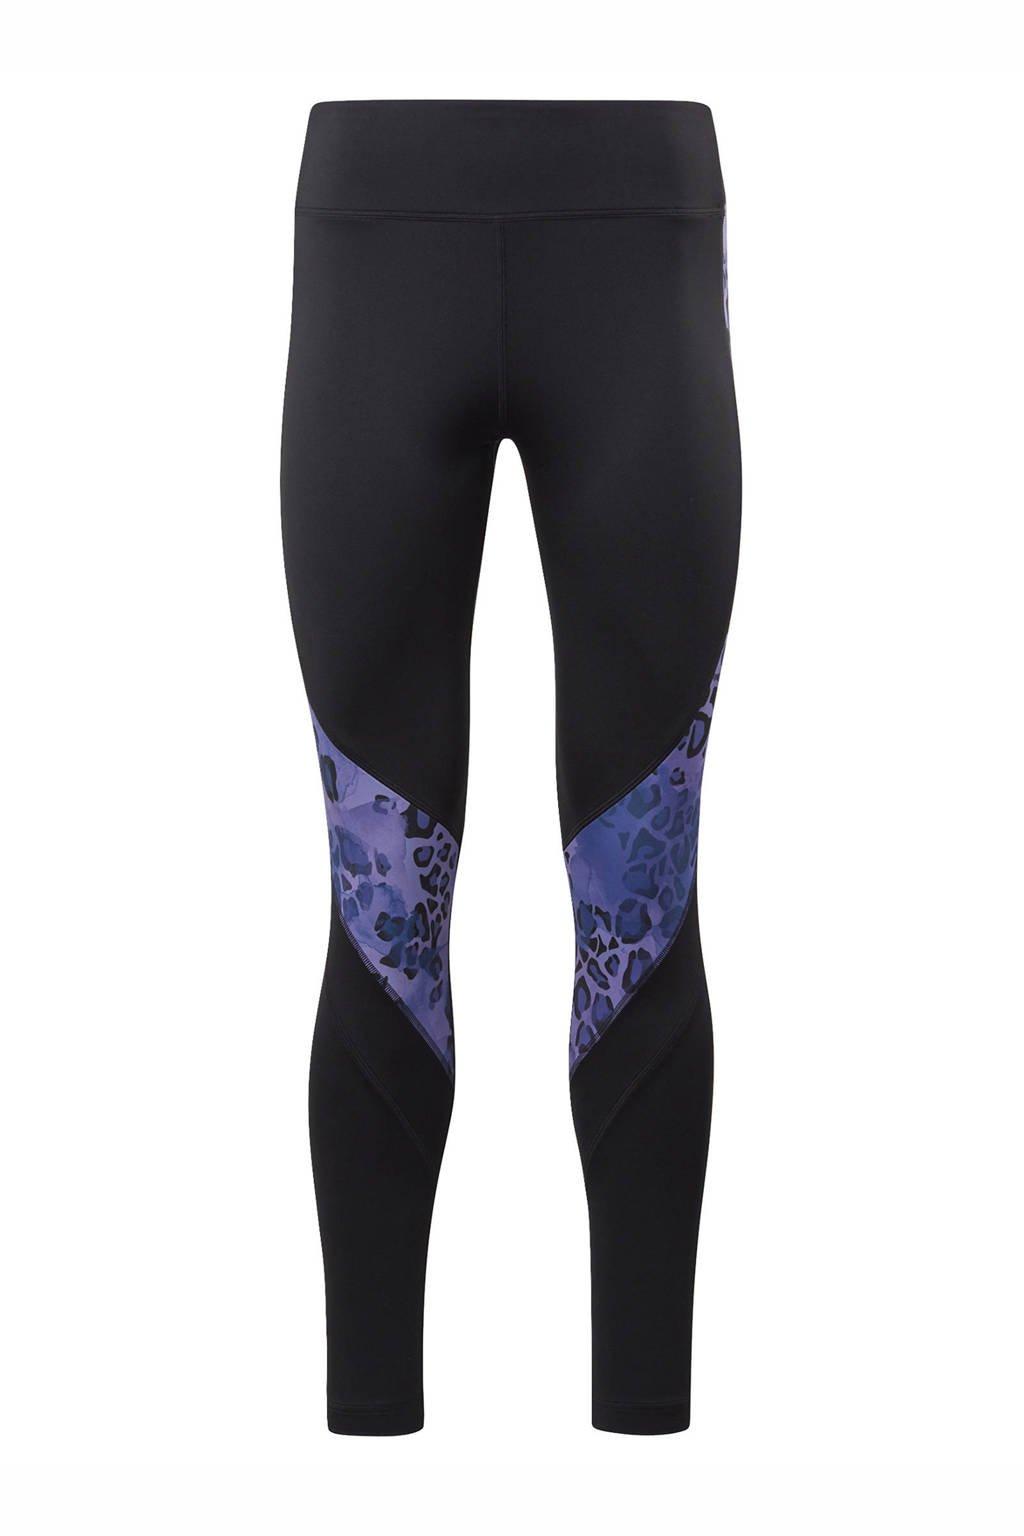 Reebok Training sportbroek zwart/paars, Zwart/paars